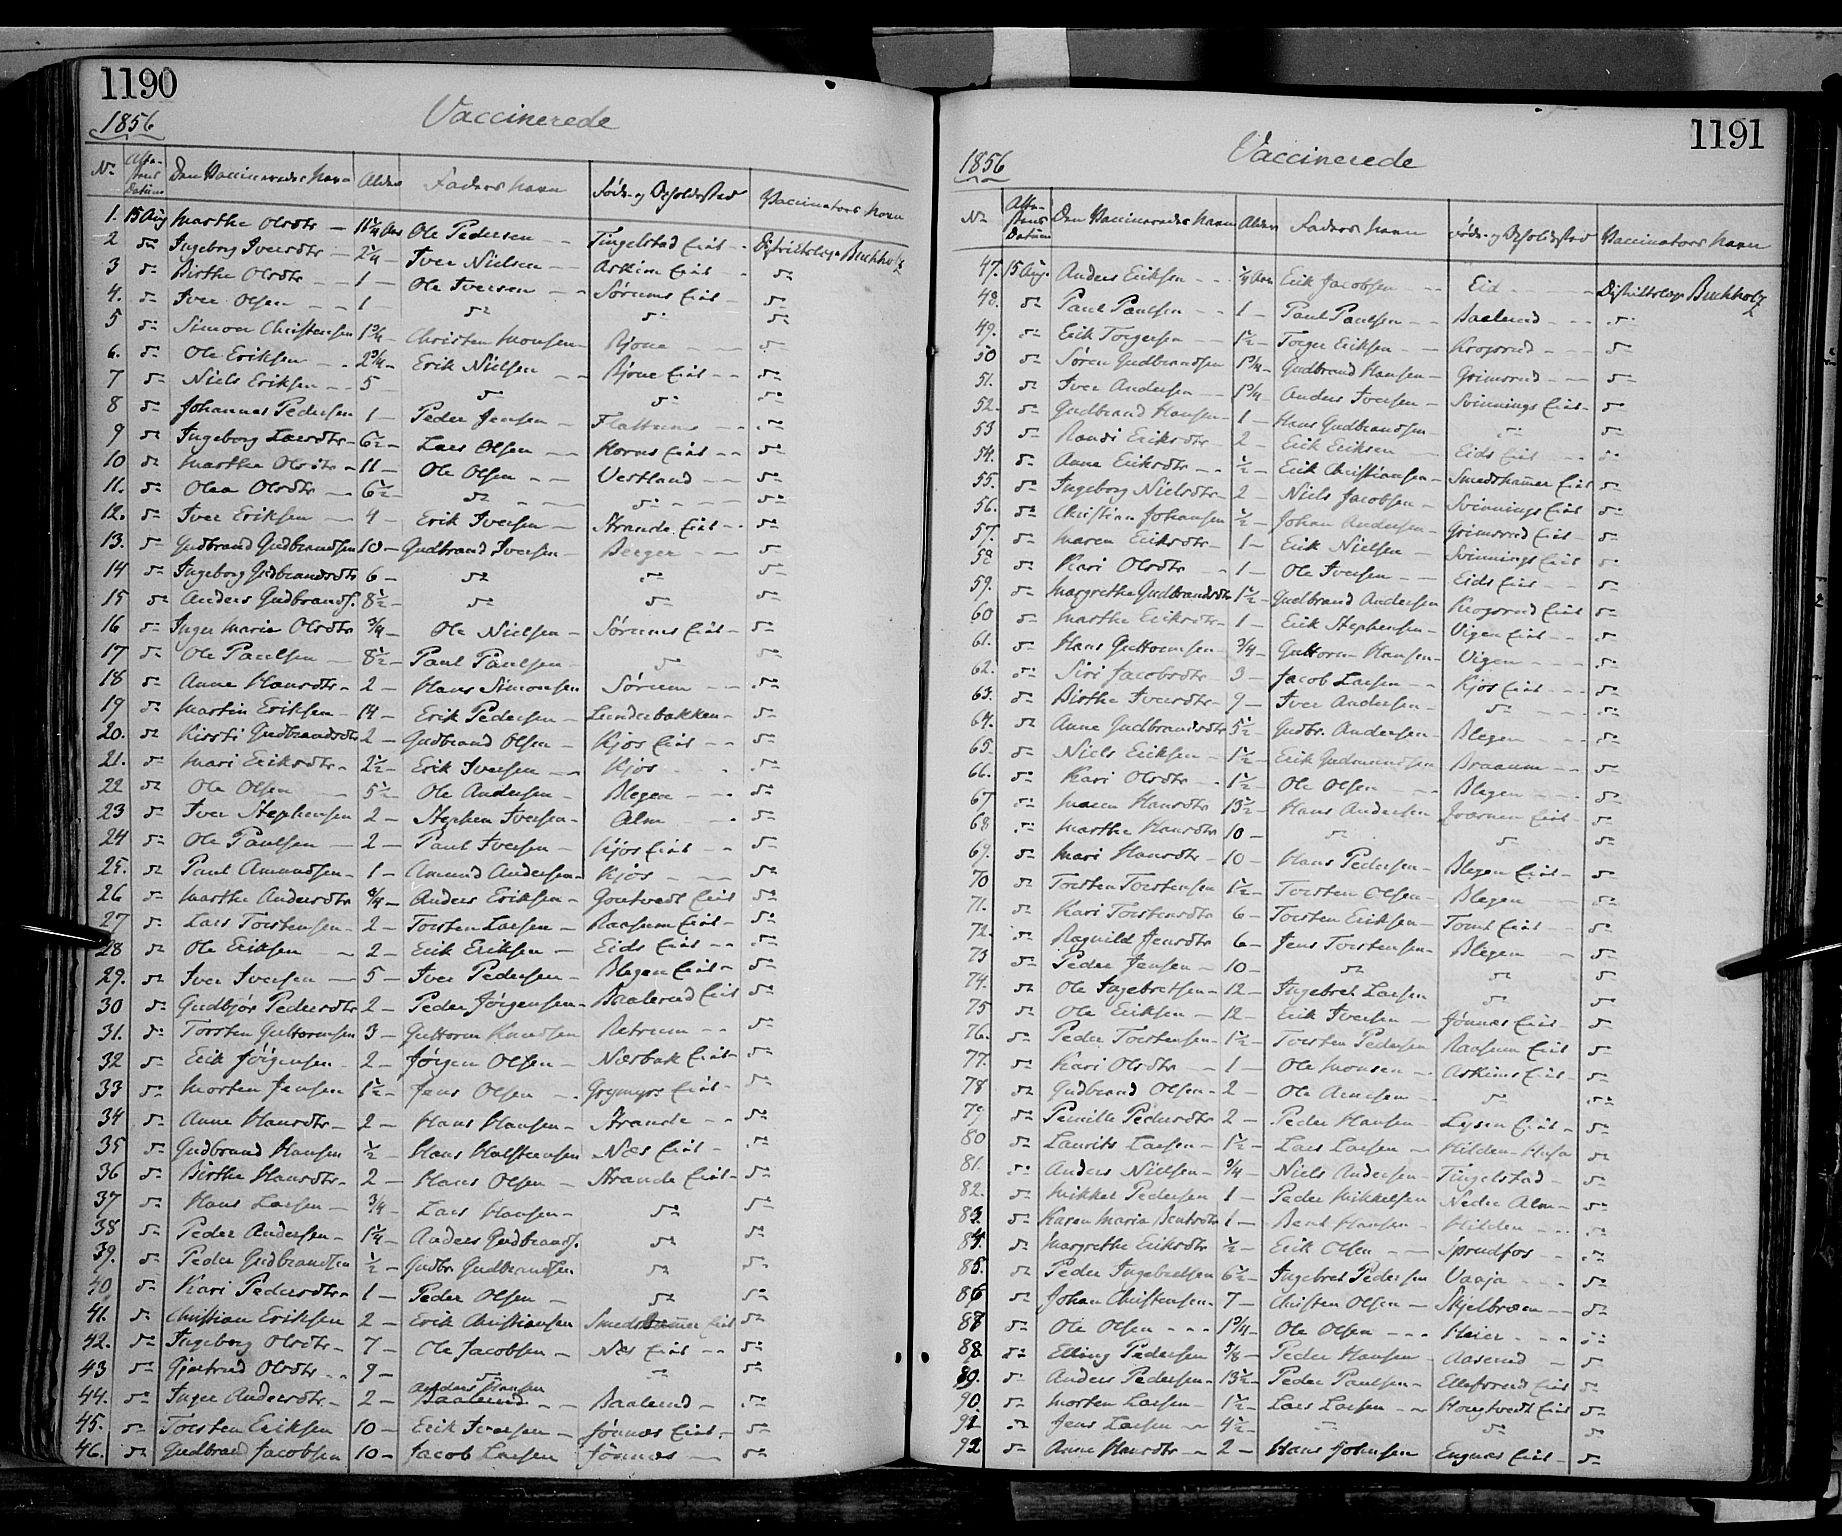 SAH, Gran prestekontor, Ministerialbok nr. 12, 1856-1874, s. 1190-1191